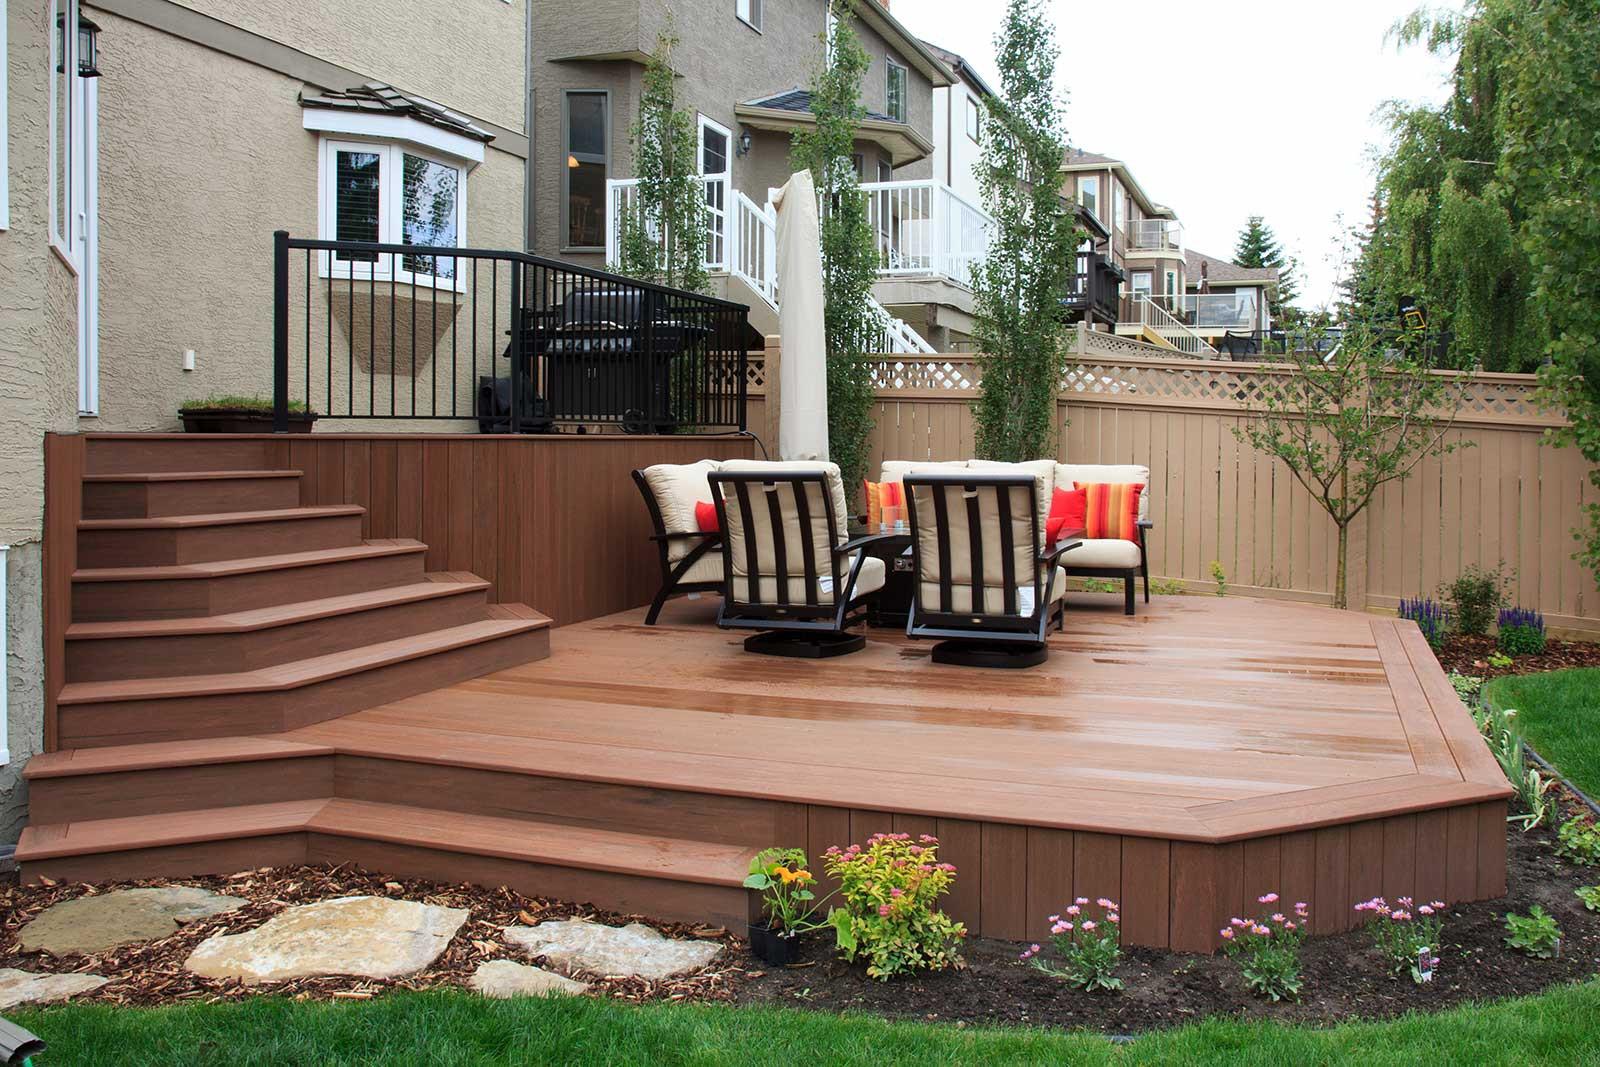 Backyard Deck Plans  Trends in Backyard Landscaping 2 posite Deck Materials